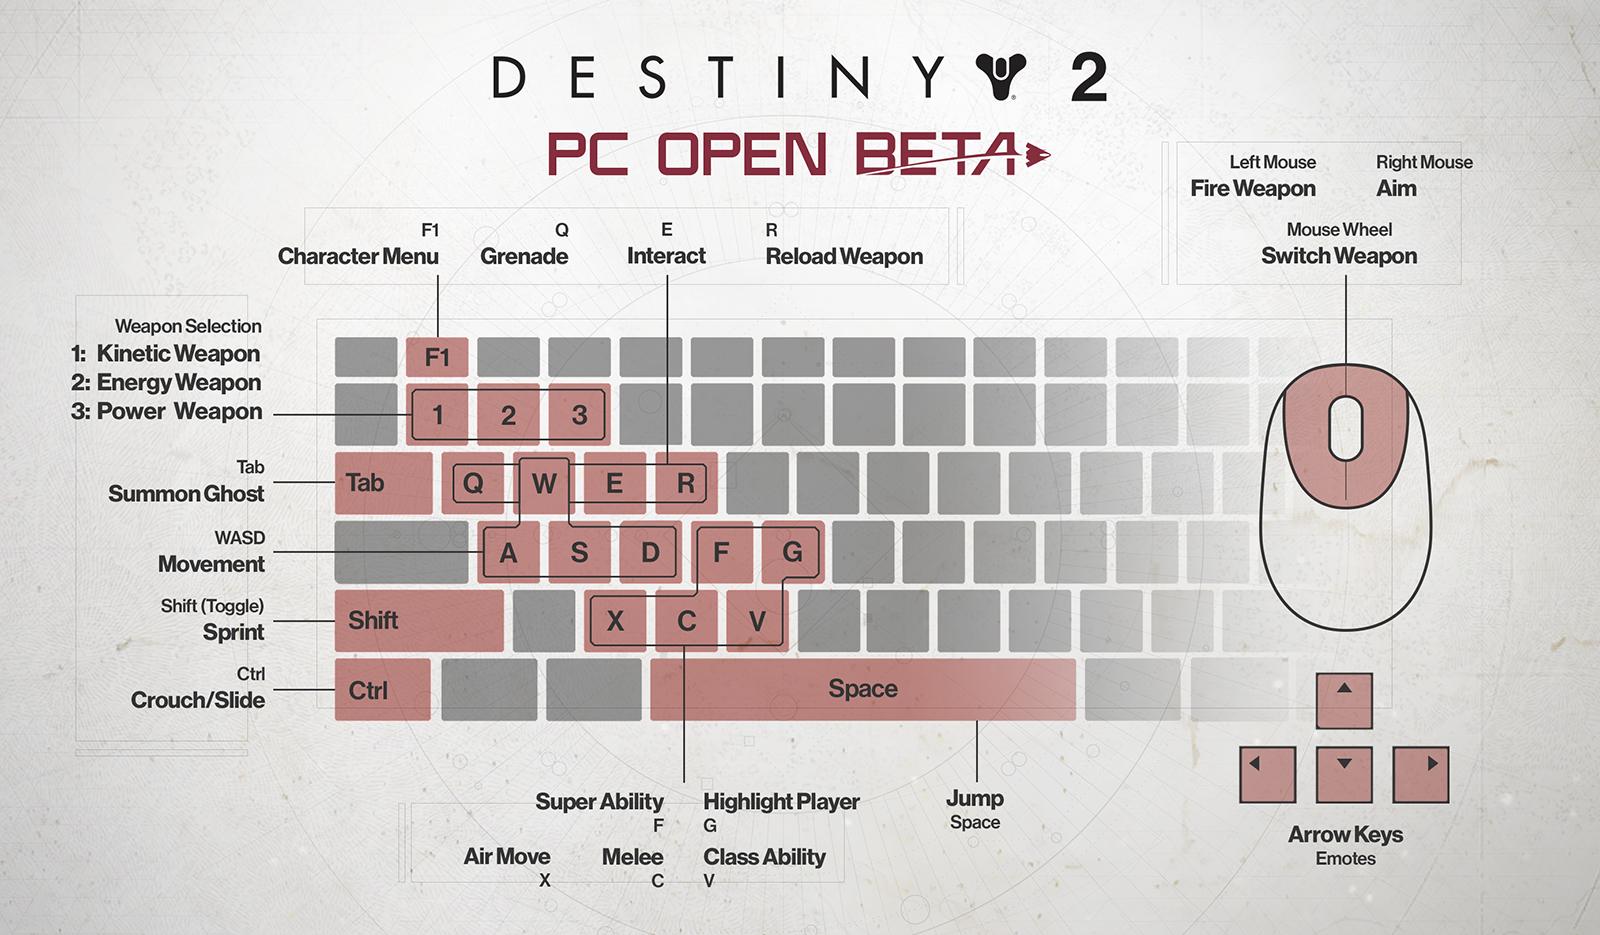 Destiny 2 key bindings